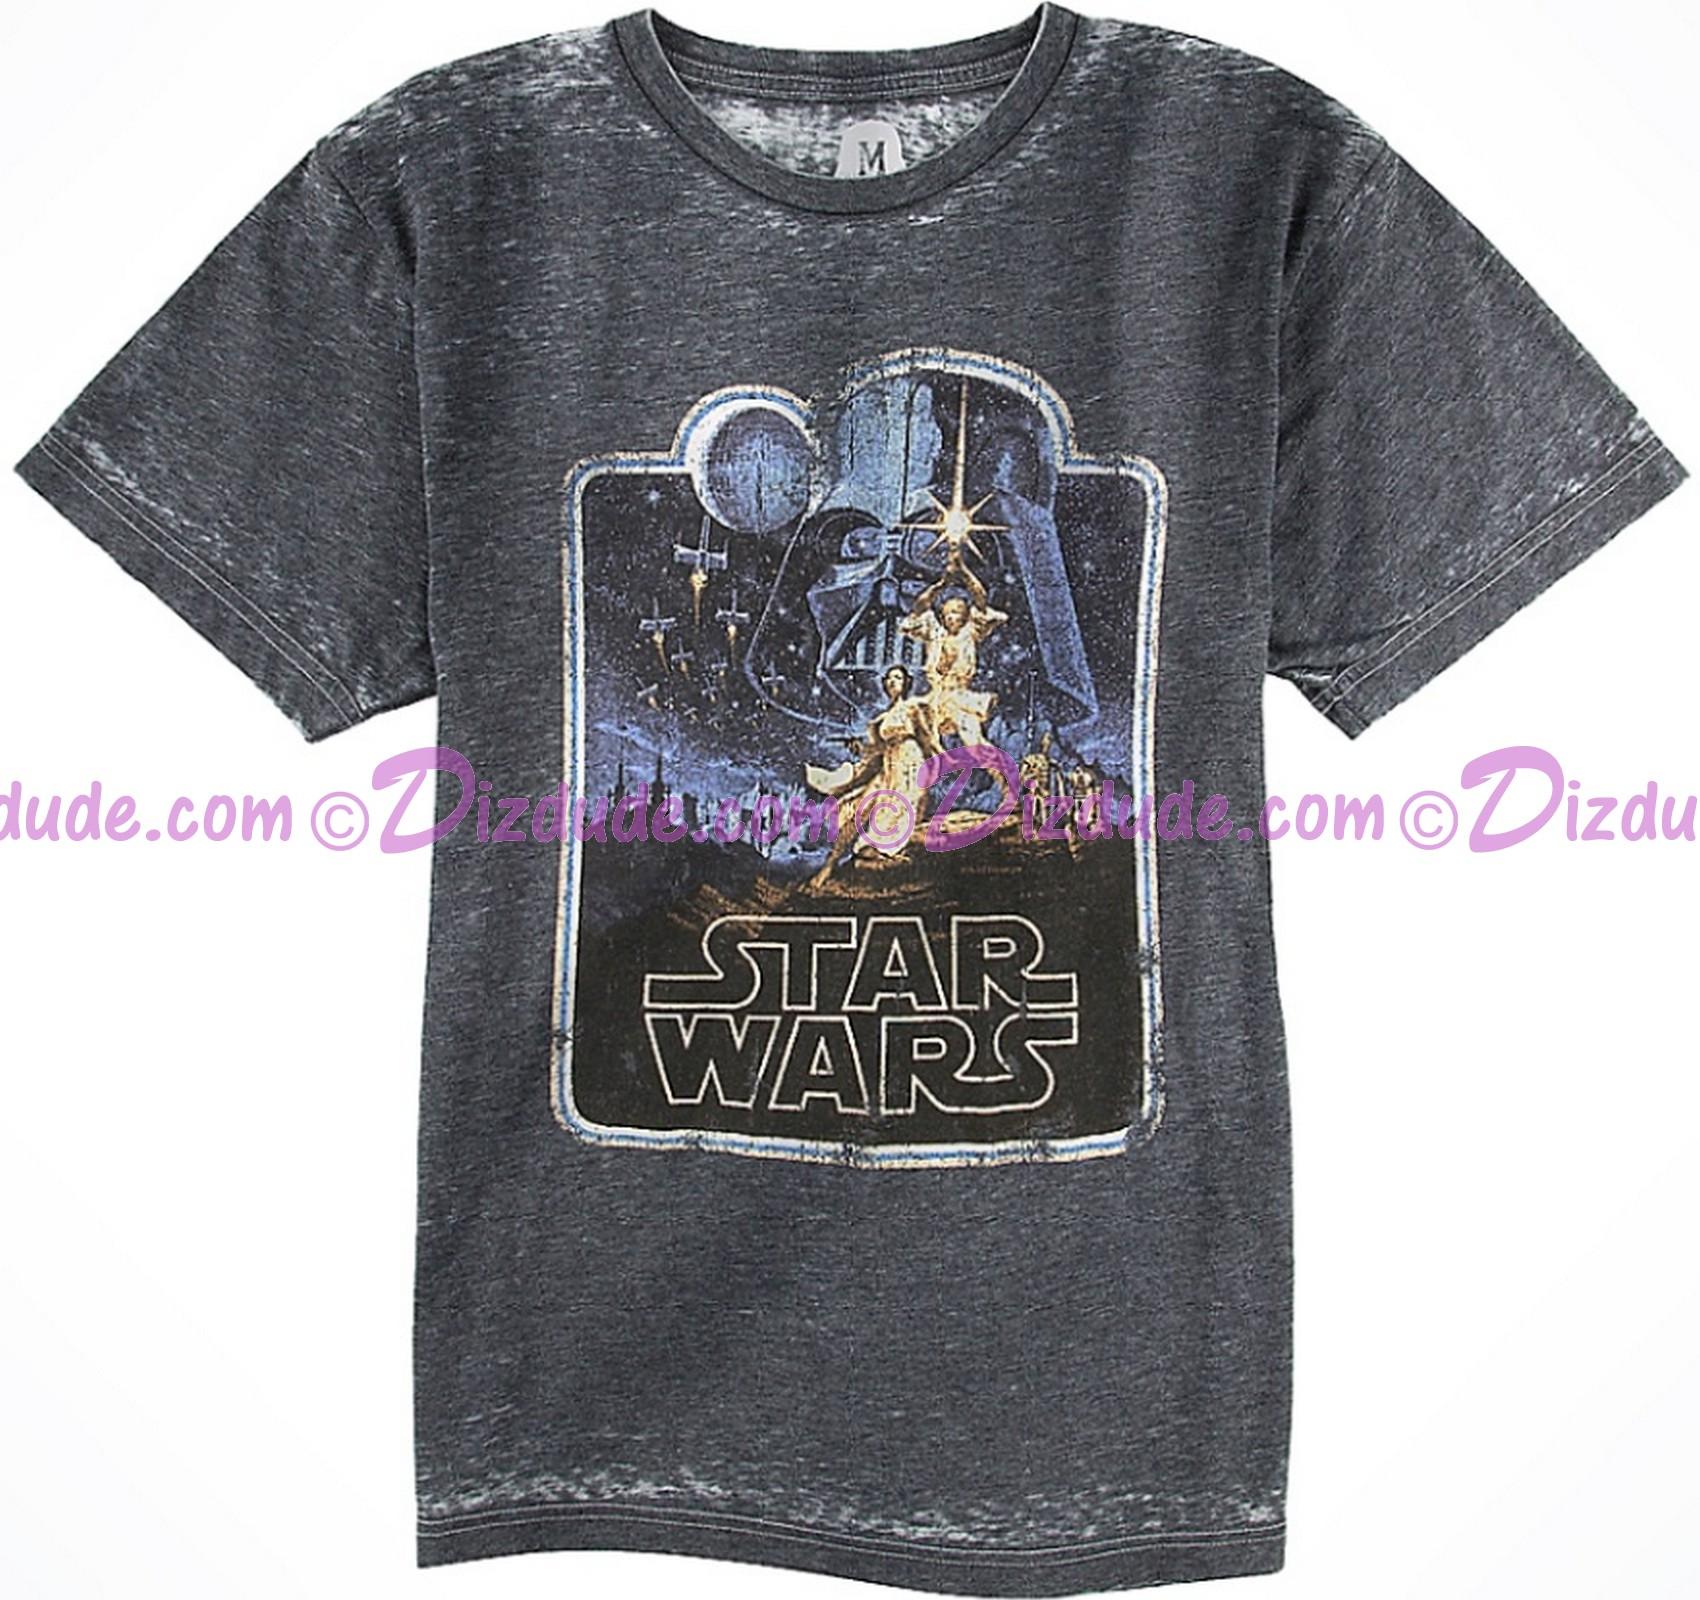 Disney Star Wars: A New Hope Adult T-Shirt (Tshirt, T shirt or Tee) © Dizdude.com